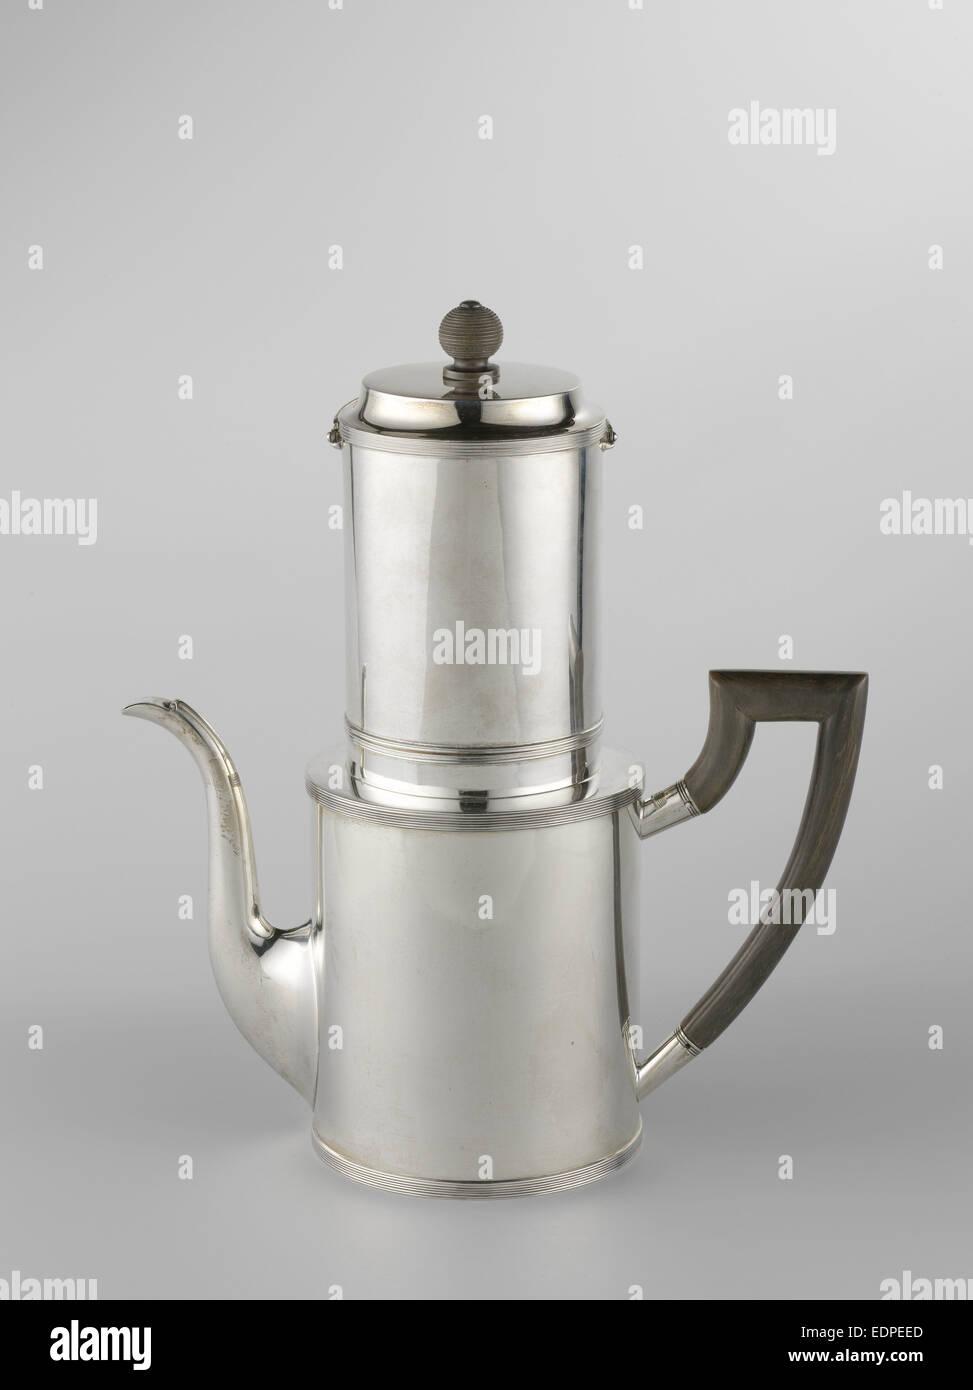 Drip filter coffee pot, Fa. Diemont, Jacobus Carrenhoff, 1816 - Stock Image